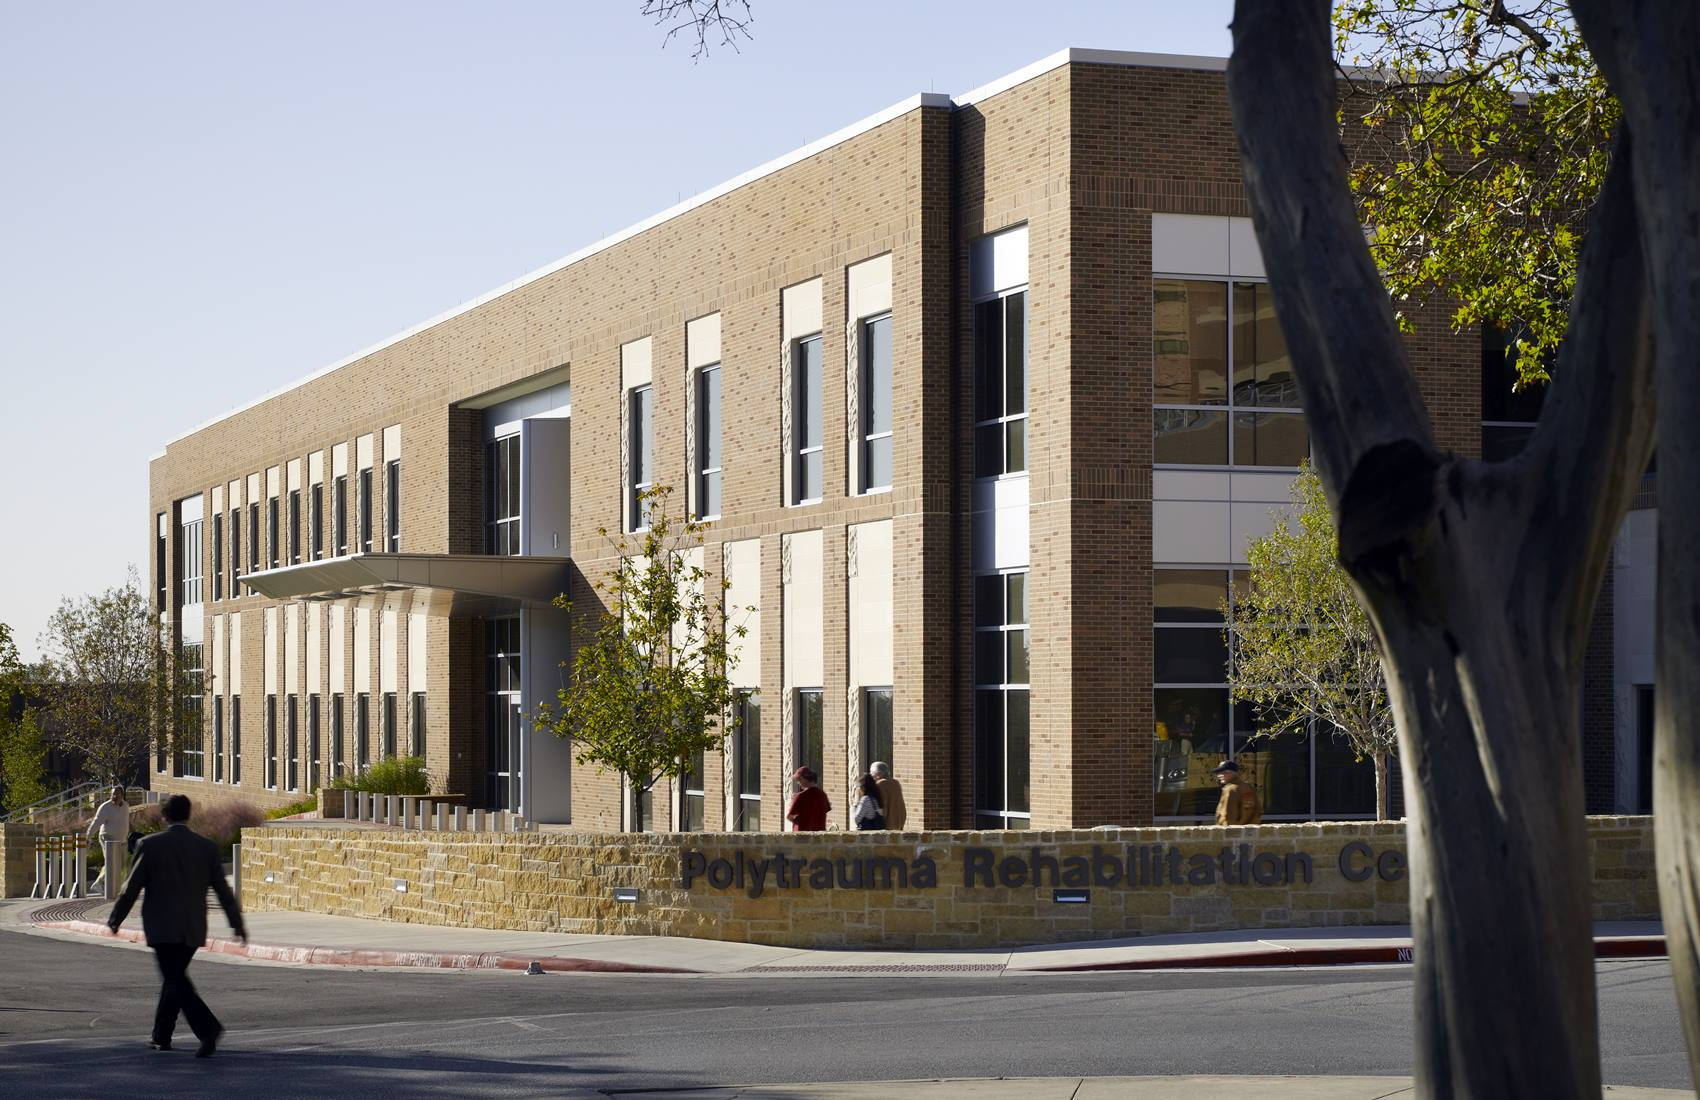 Polytrauma Rehabilitation Center